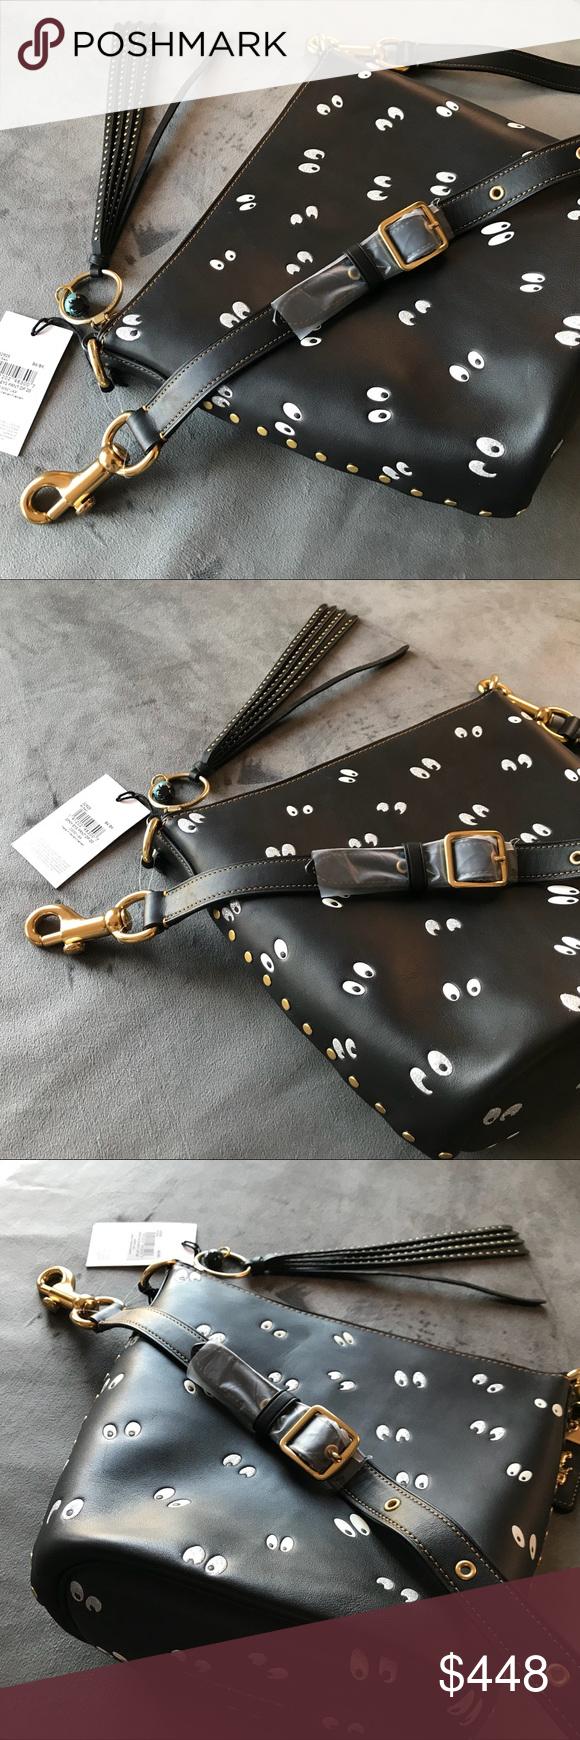 974f4a6af625 Disney Coach bag Spooky Eyes crossbody duffle 20 Glovetanned leather.  Inside zip  amp  snap